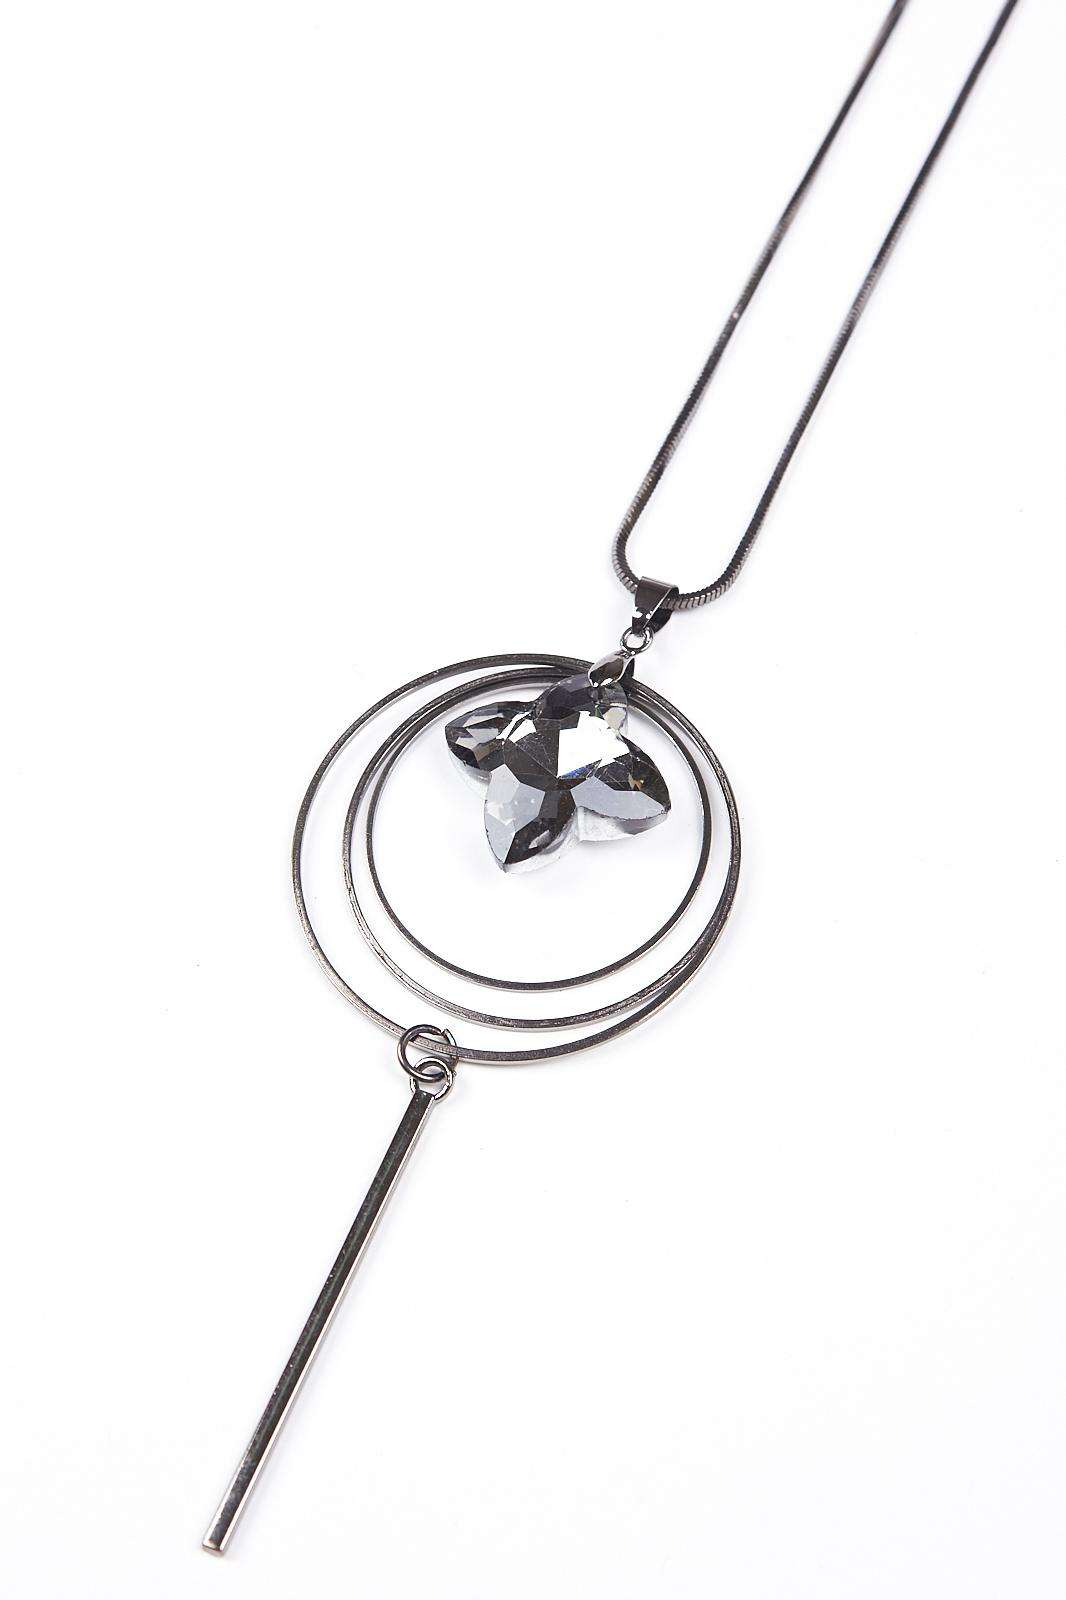 Купить Подвеска Fashion Jewelry, Подвеска 4096 черненое серебро, Китай